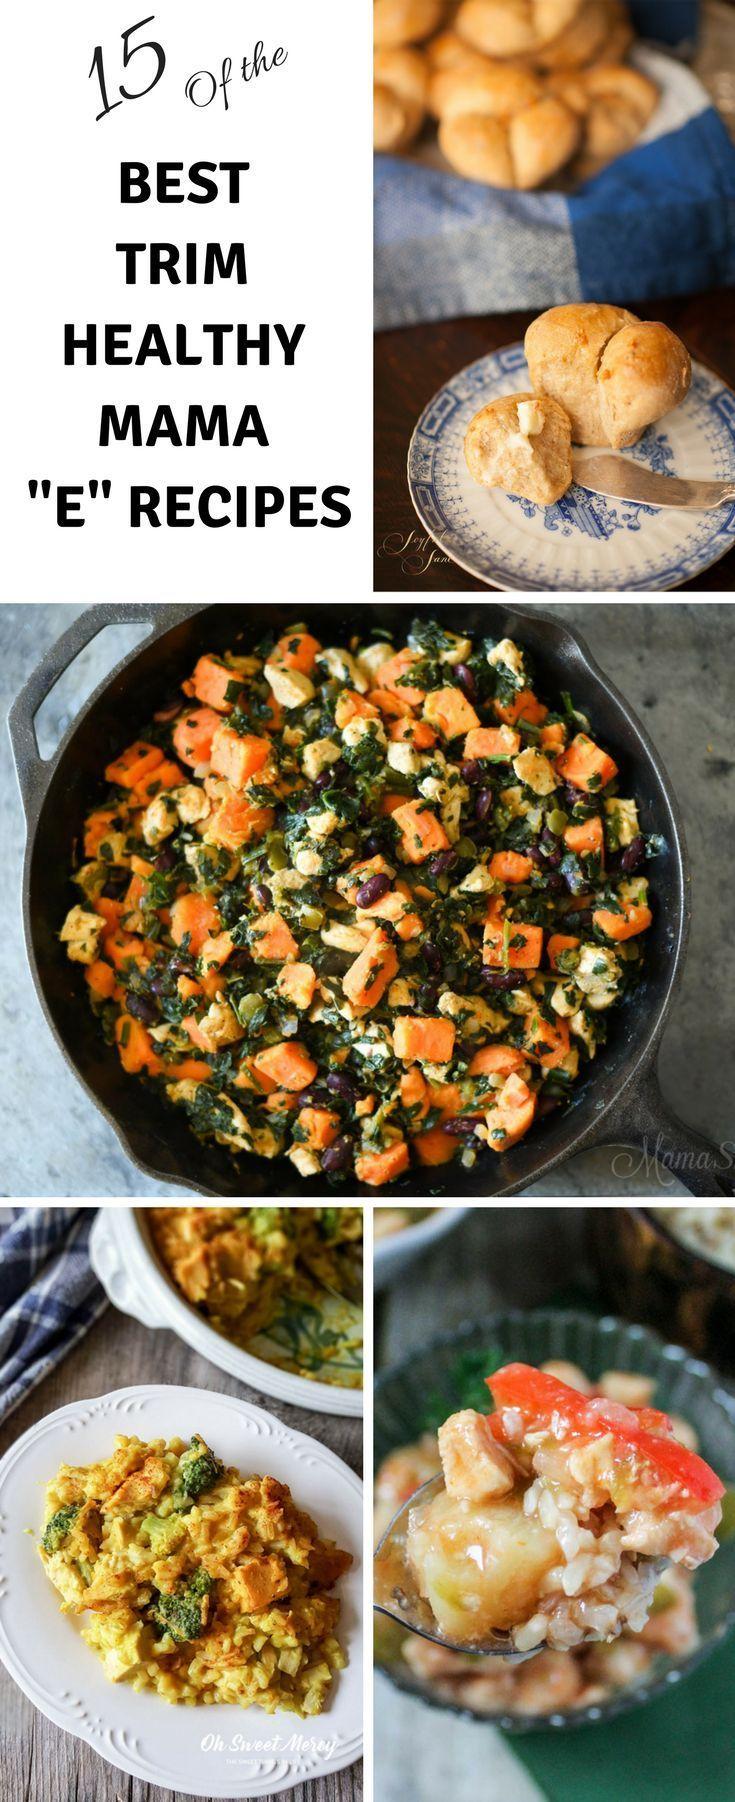 15 Of The Tastiest Trim Healthy Mama 'E' Recipes